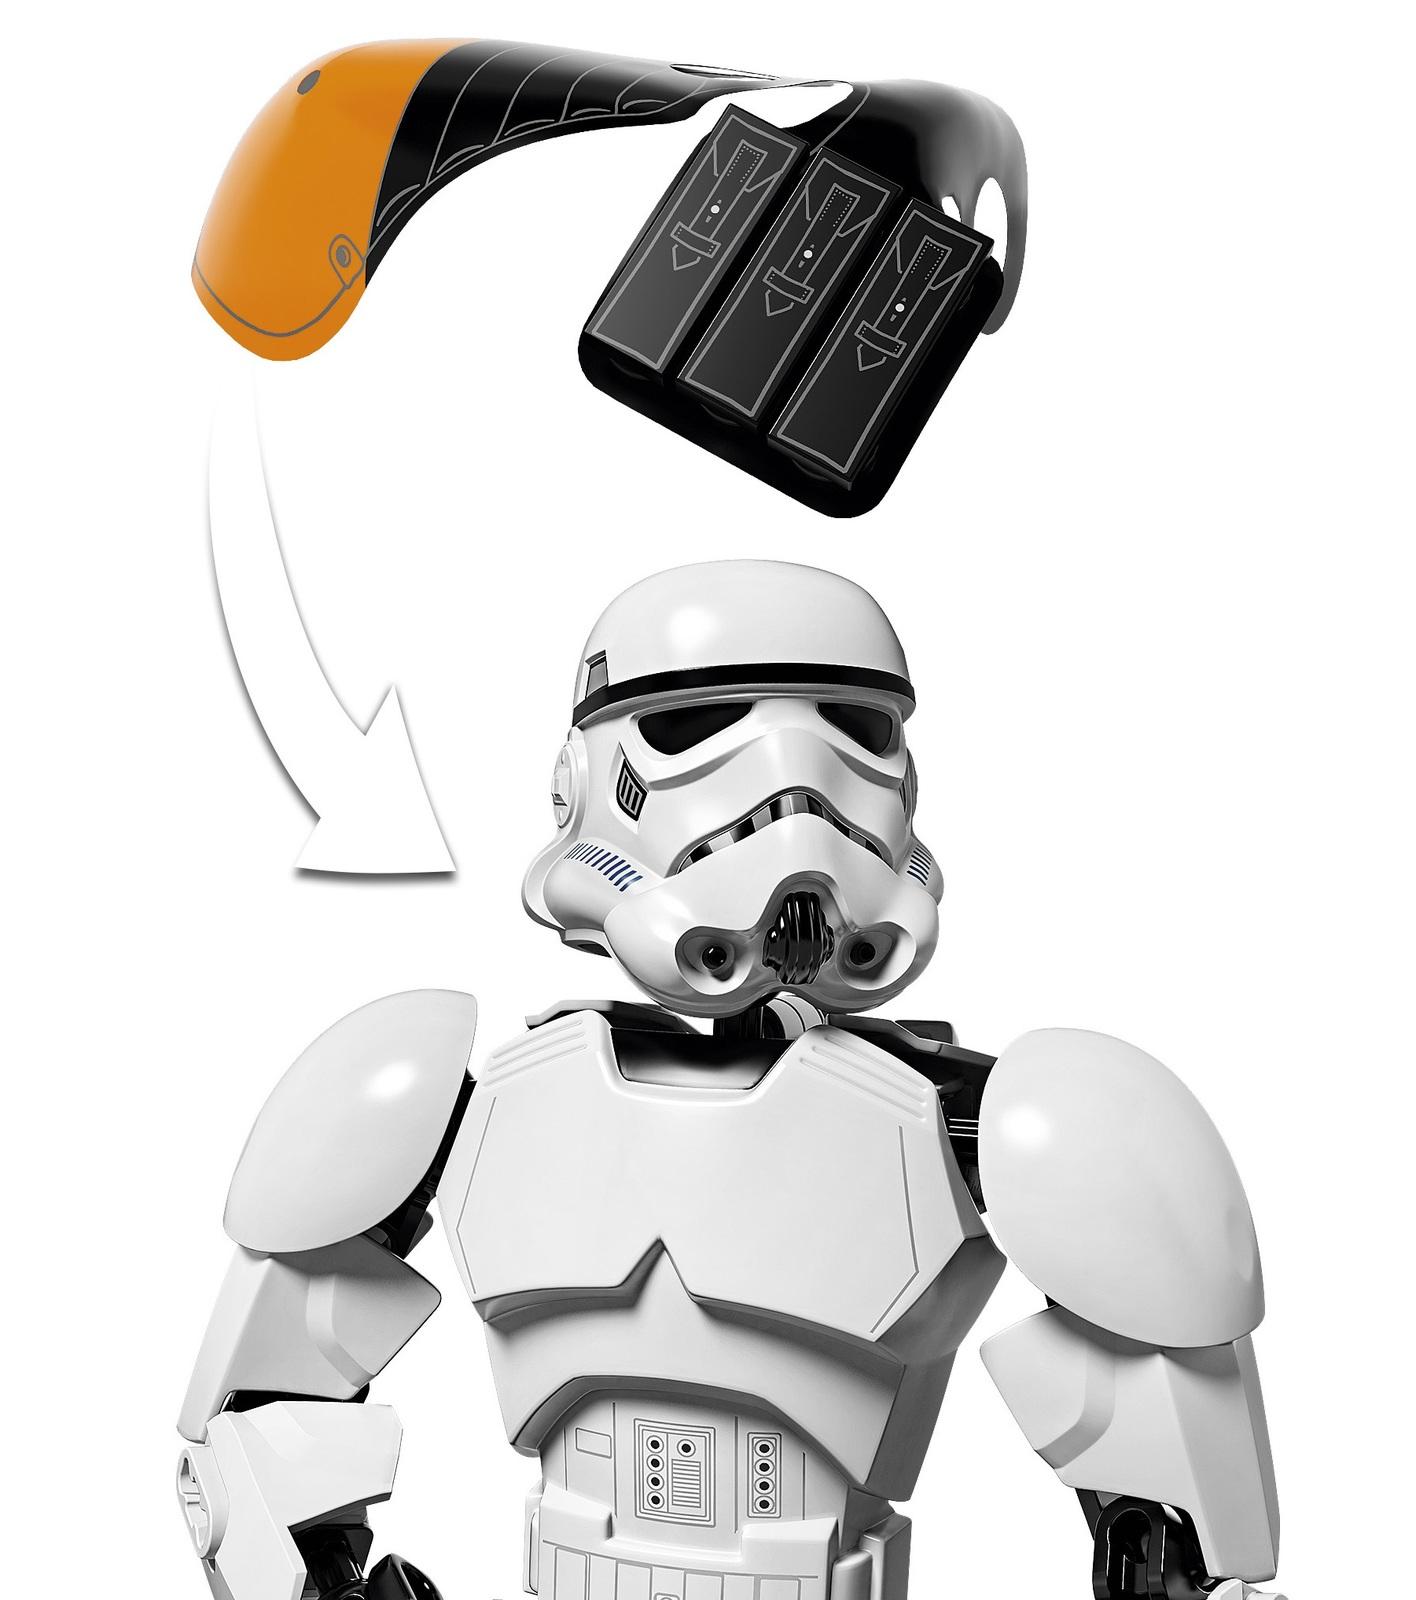 LEGO Star Wars Stormtrooper Commander 75531 Toy At